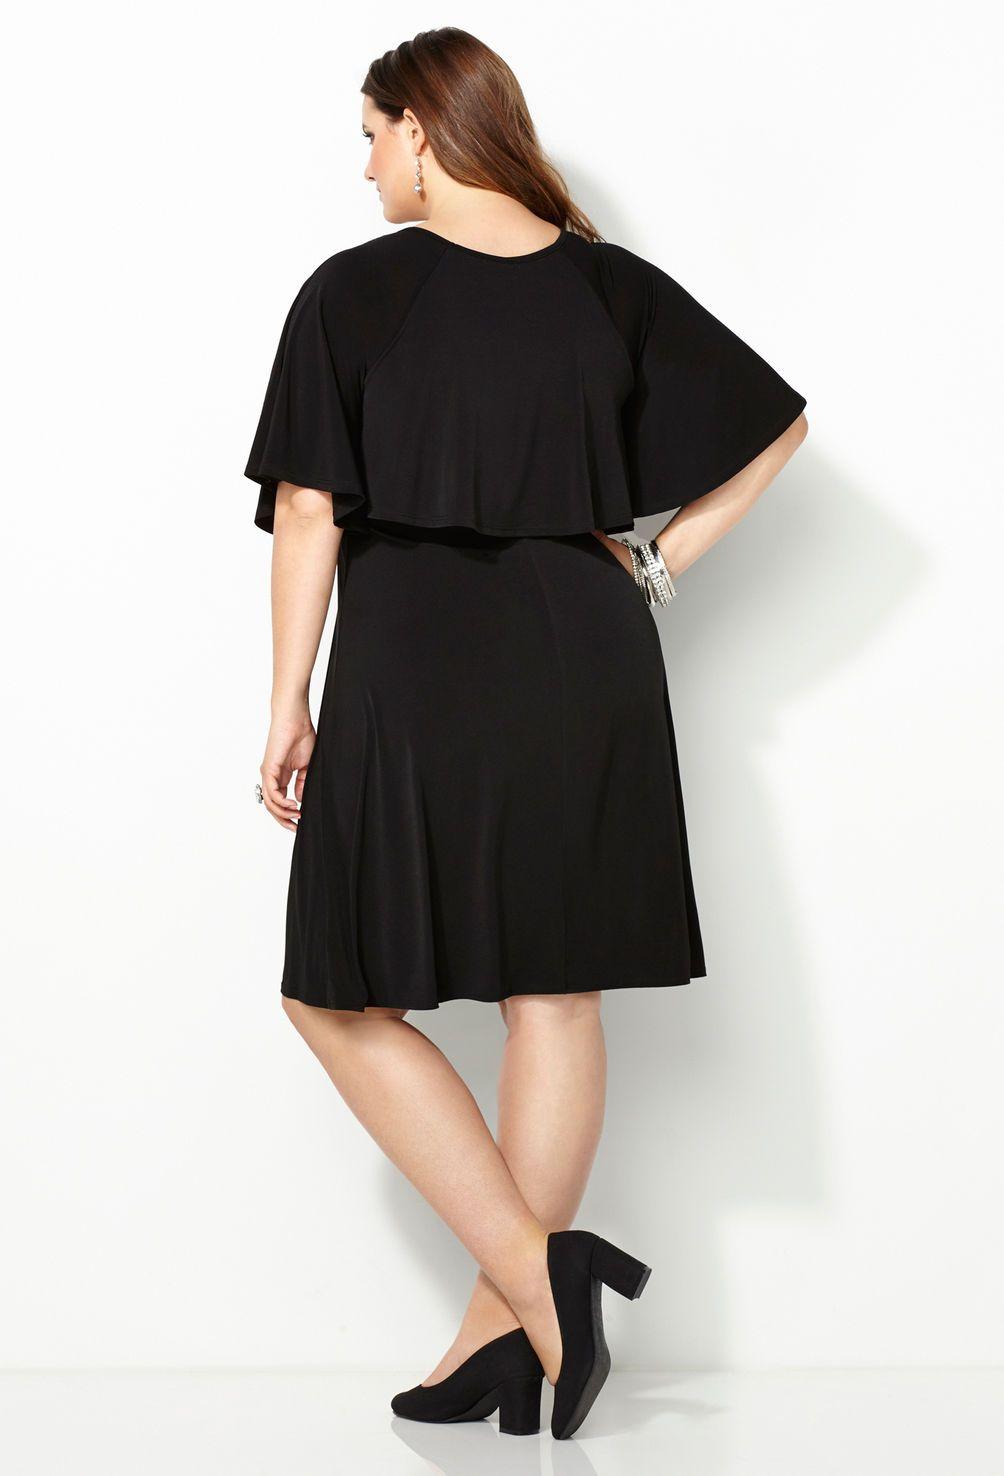 Studded Overlay Dress-Plus Size Dress-Avenue | Sarah Slick ...